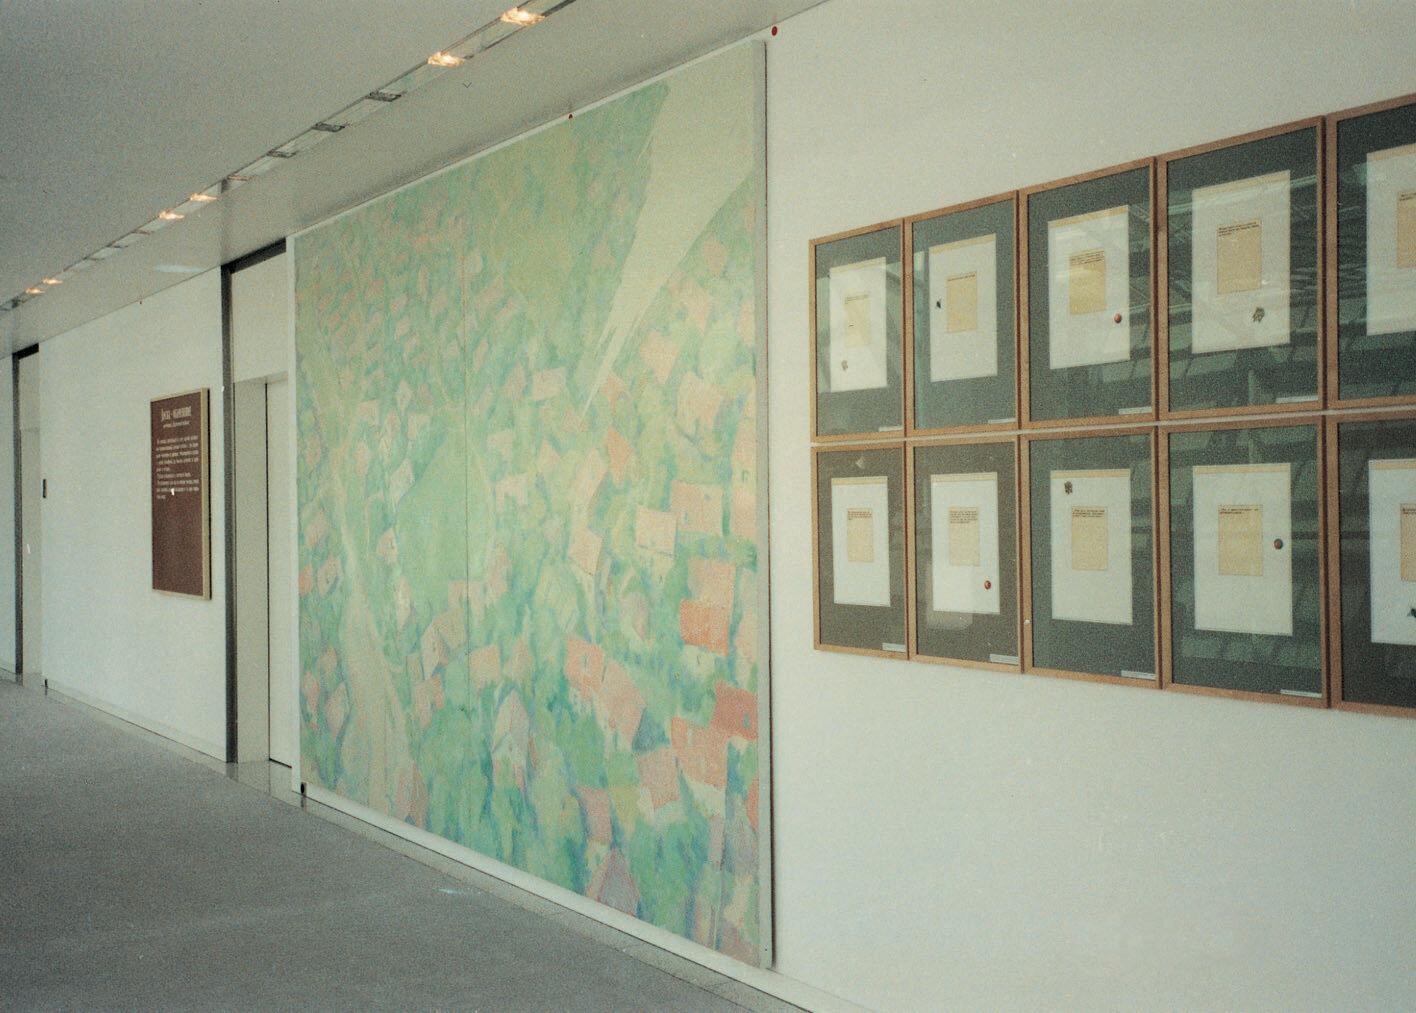 View-of-installation-Dresdner-Bank-Frankfurt-am-Main-1991-Photo-by-Emilia-Kabakov.jpg